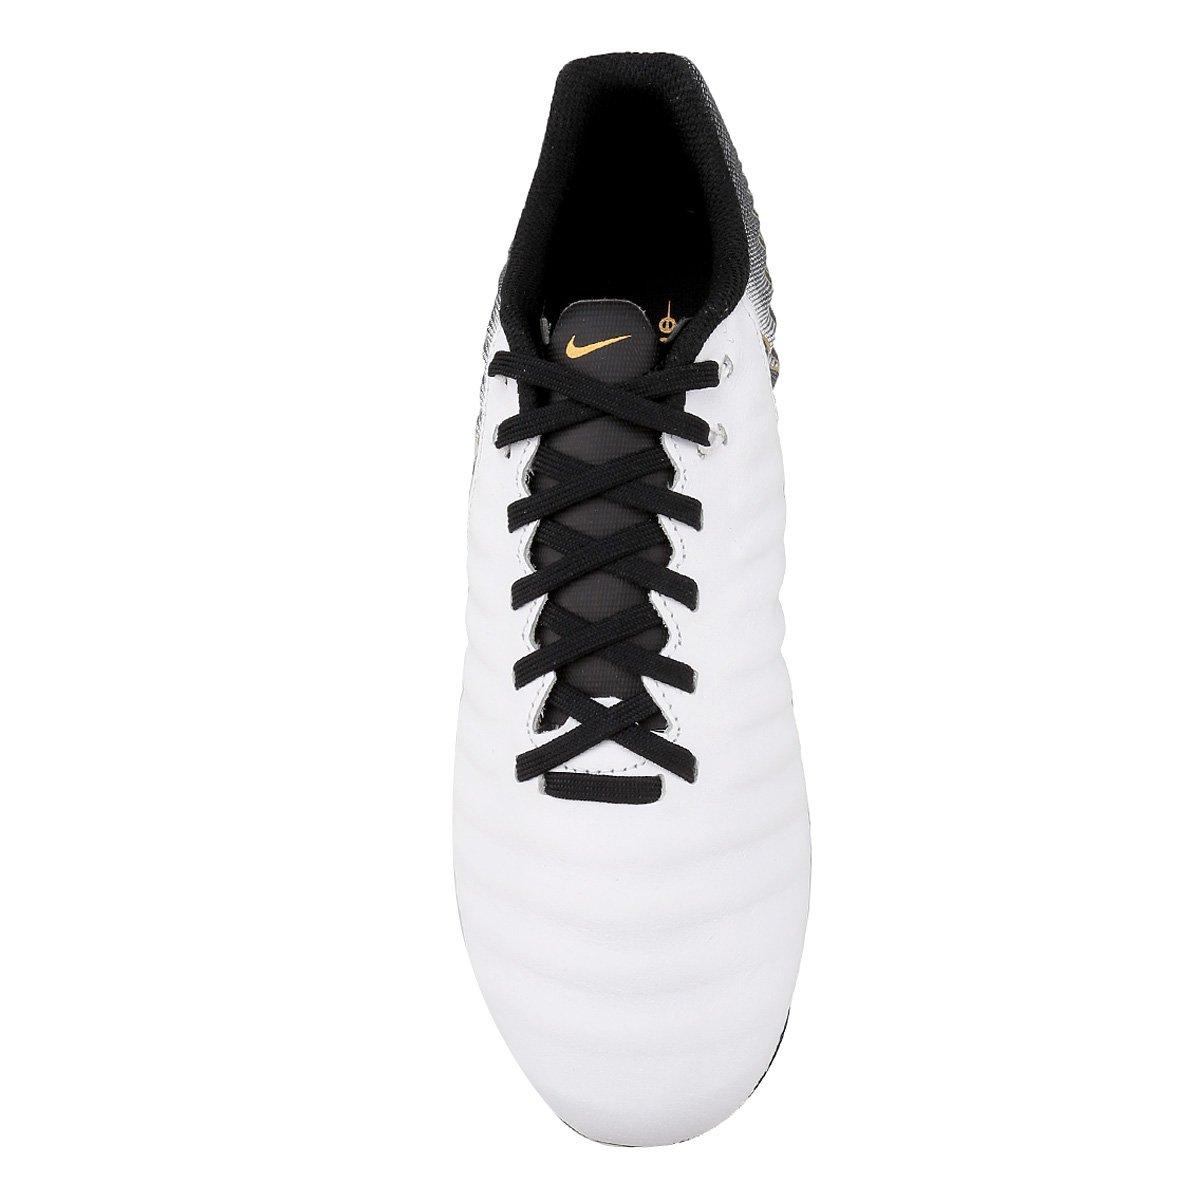 Chuteira Campo Nike Tiempo Legend 7 Academy FG - Branco e Preto ... 6decaa1a17567